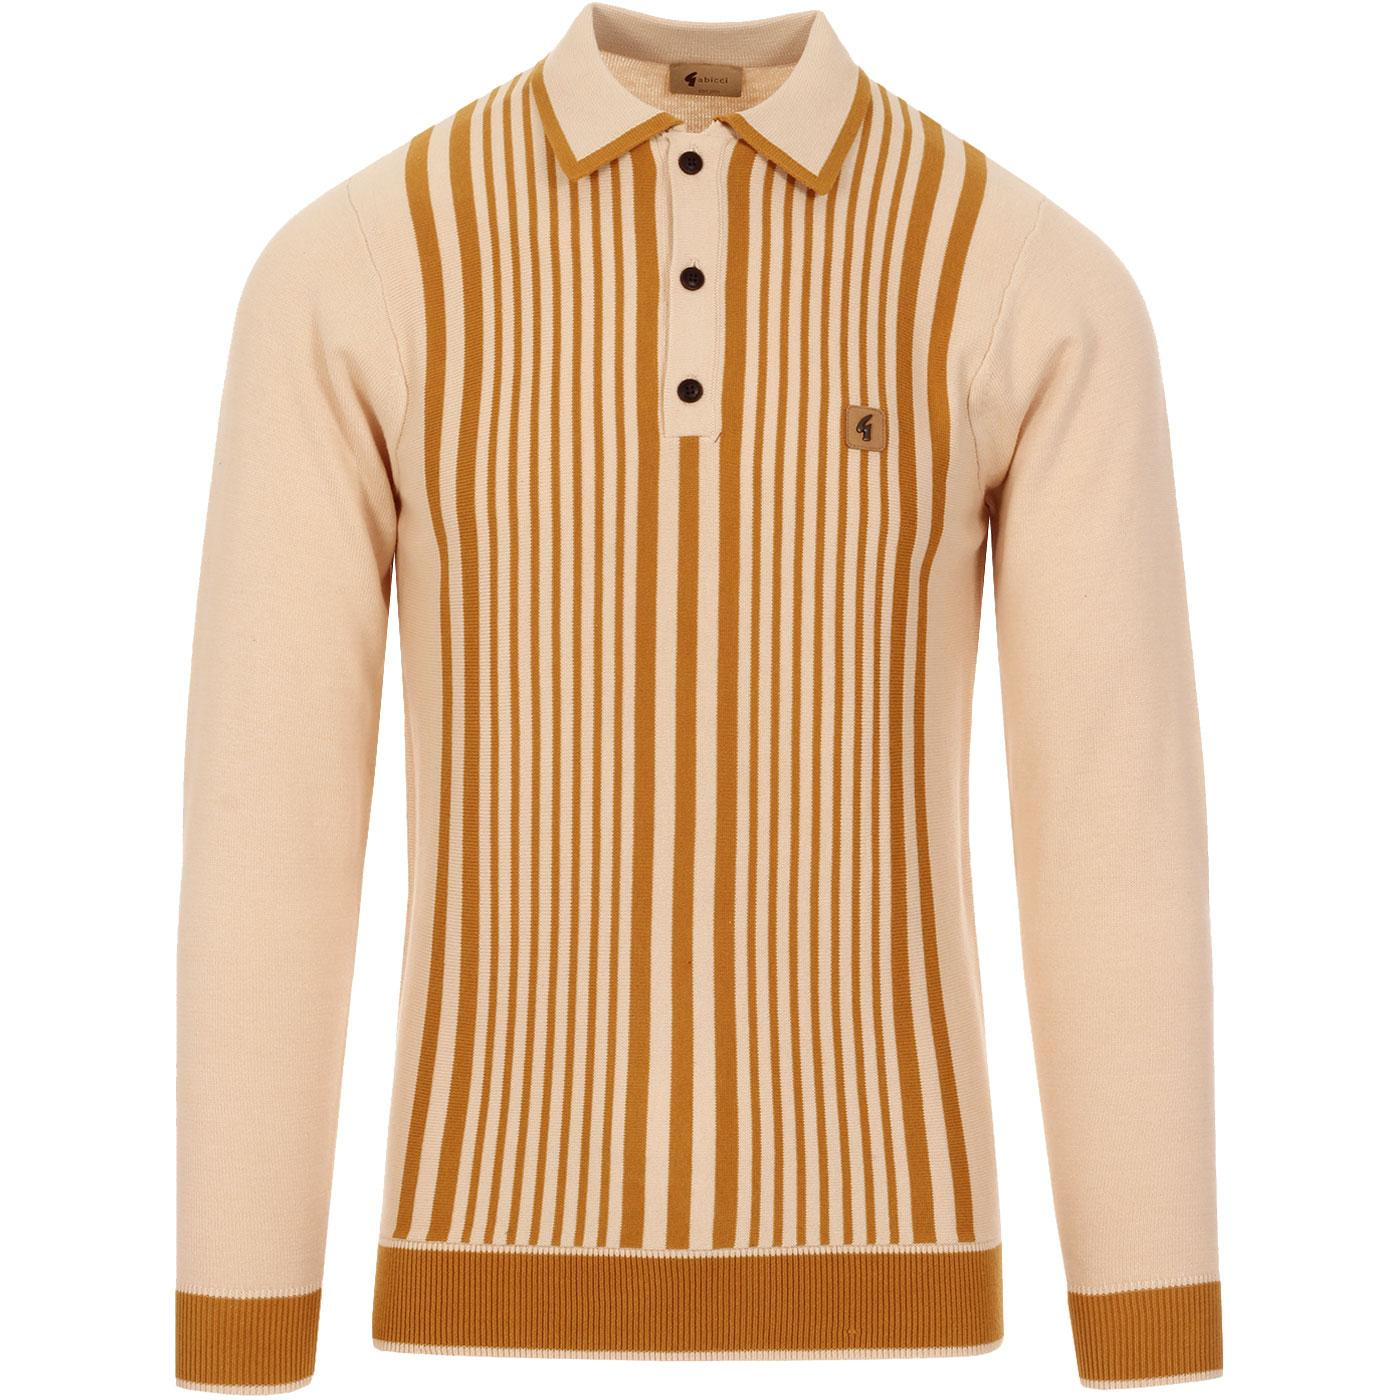 Strand GABICCI VINTAGE Mod Stripe Knitted Polo